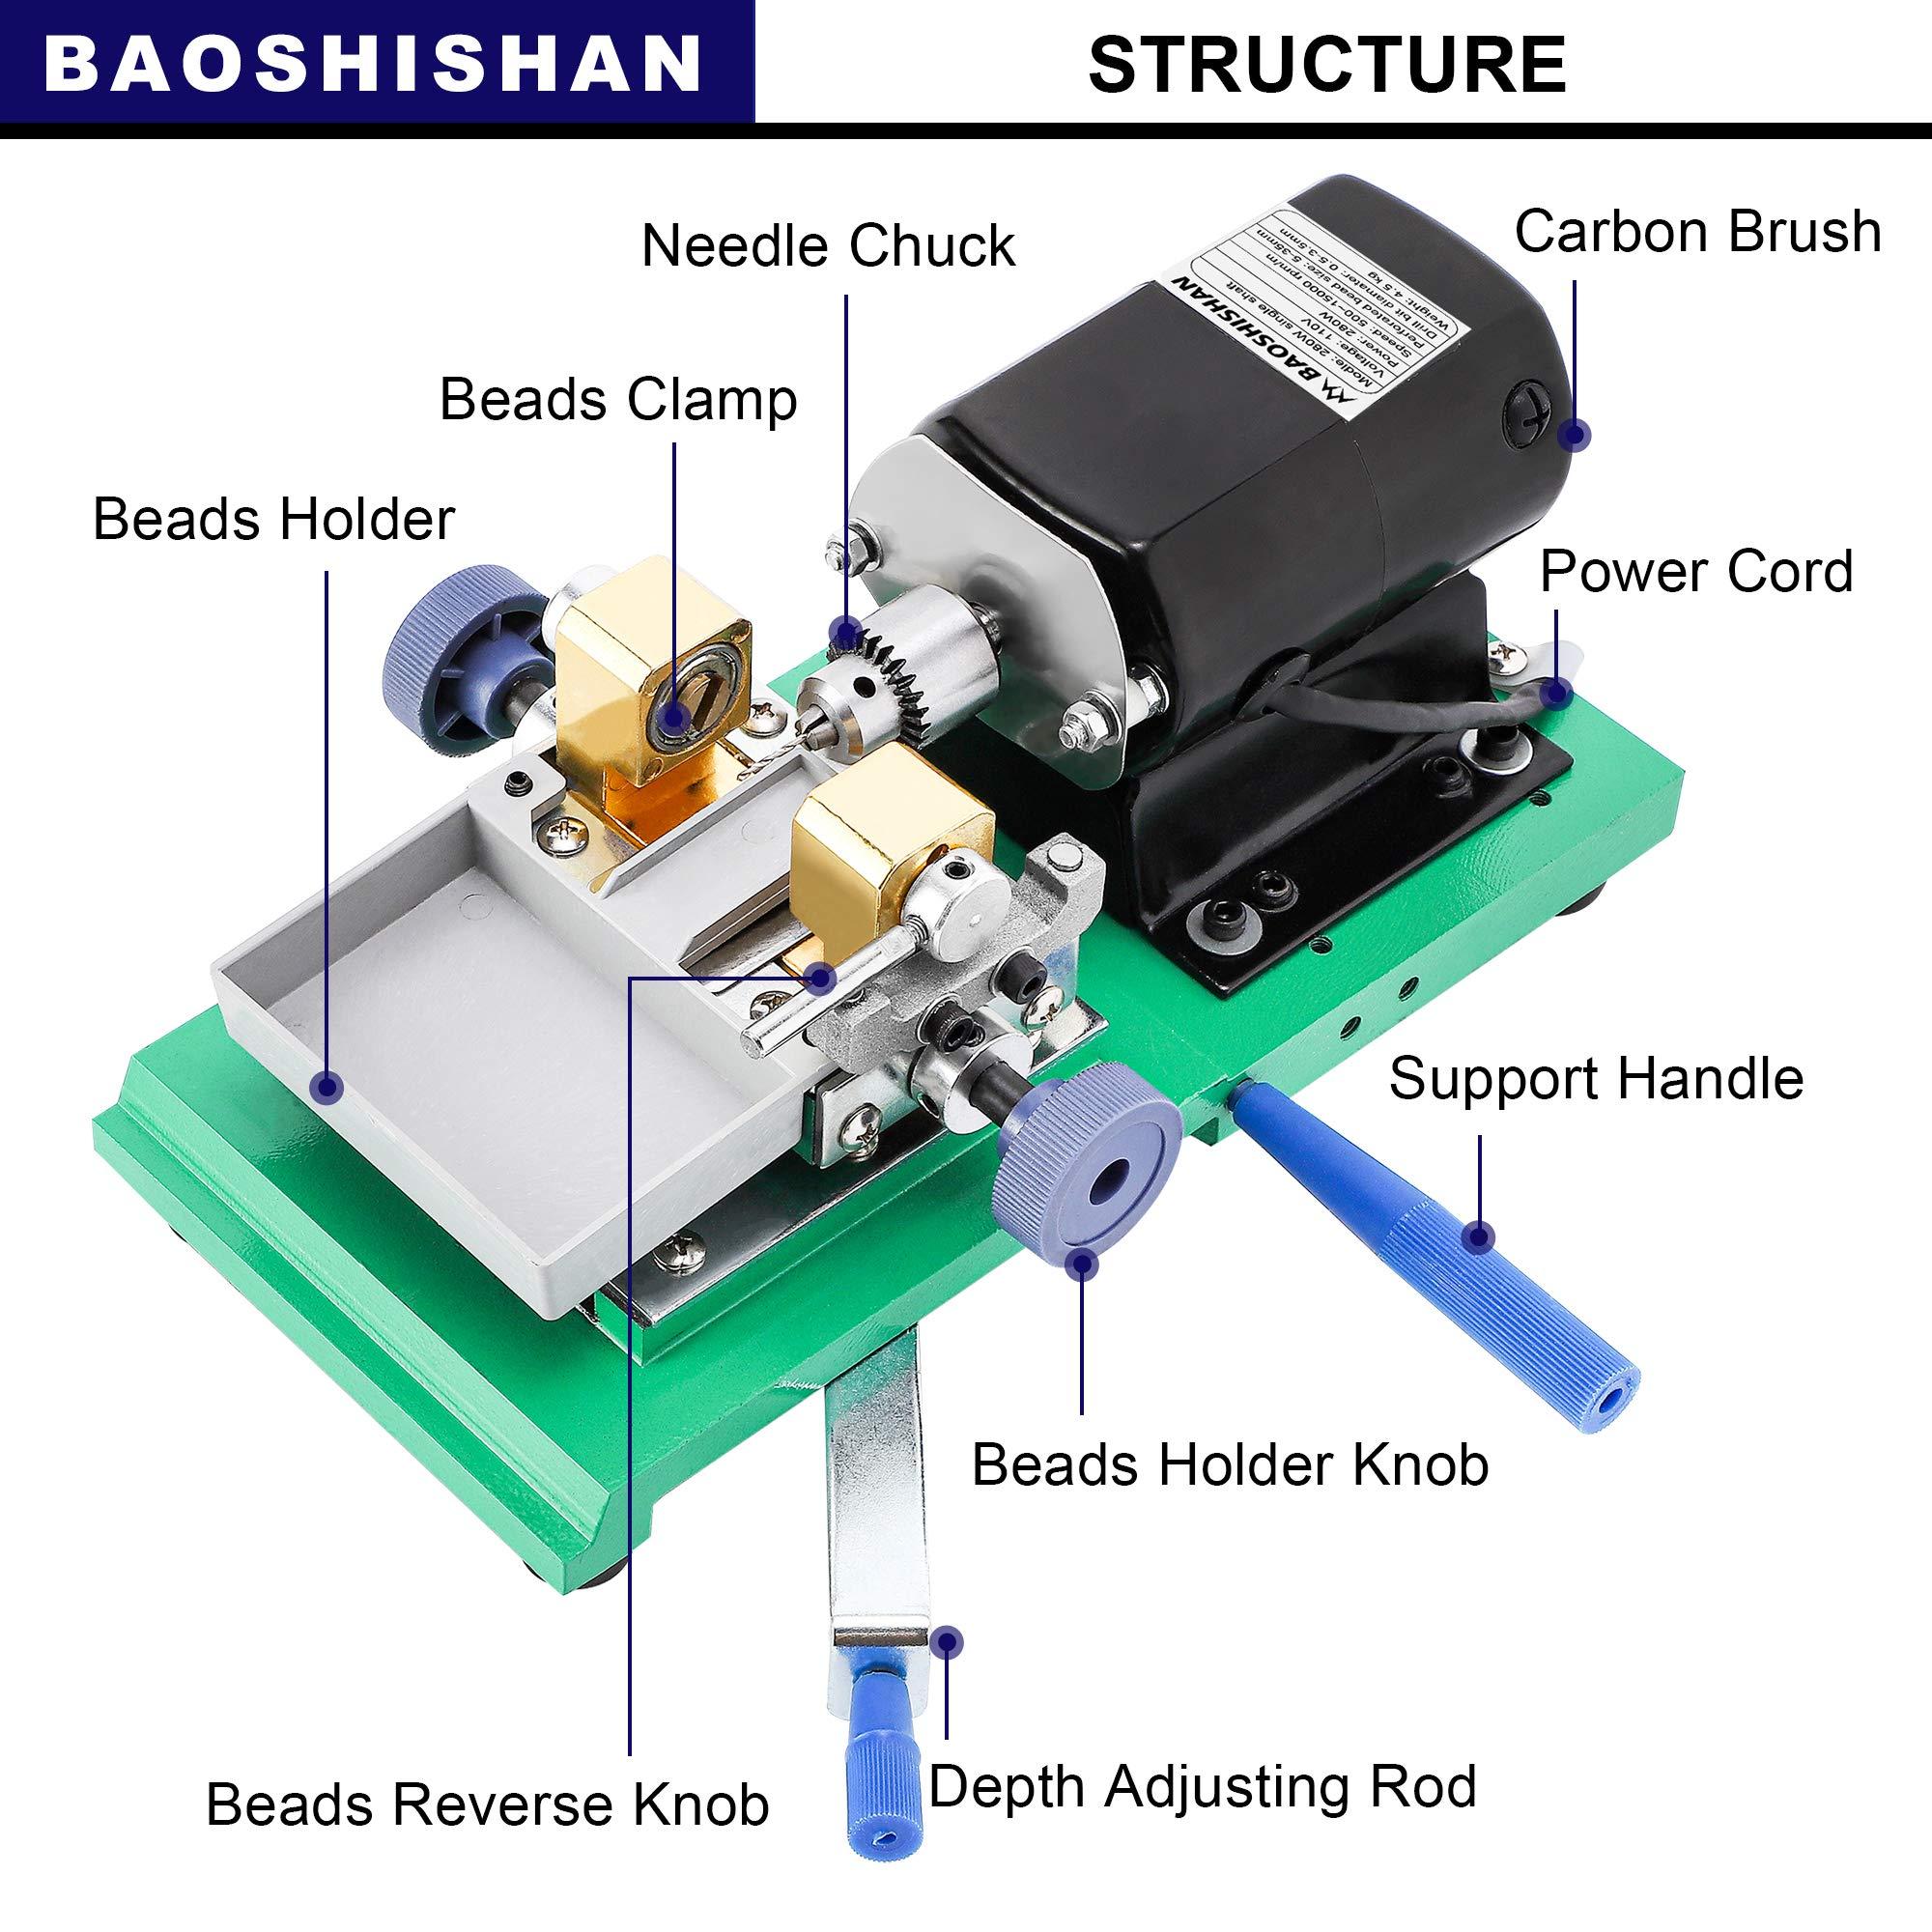 BAOSHISHAN 280W Pearl Drilling Machine Coral Driller Amber Holing Machine Upgrade Large Plastic Pallets Full Set Speed Adjustable 110V